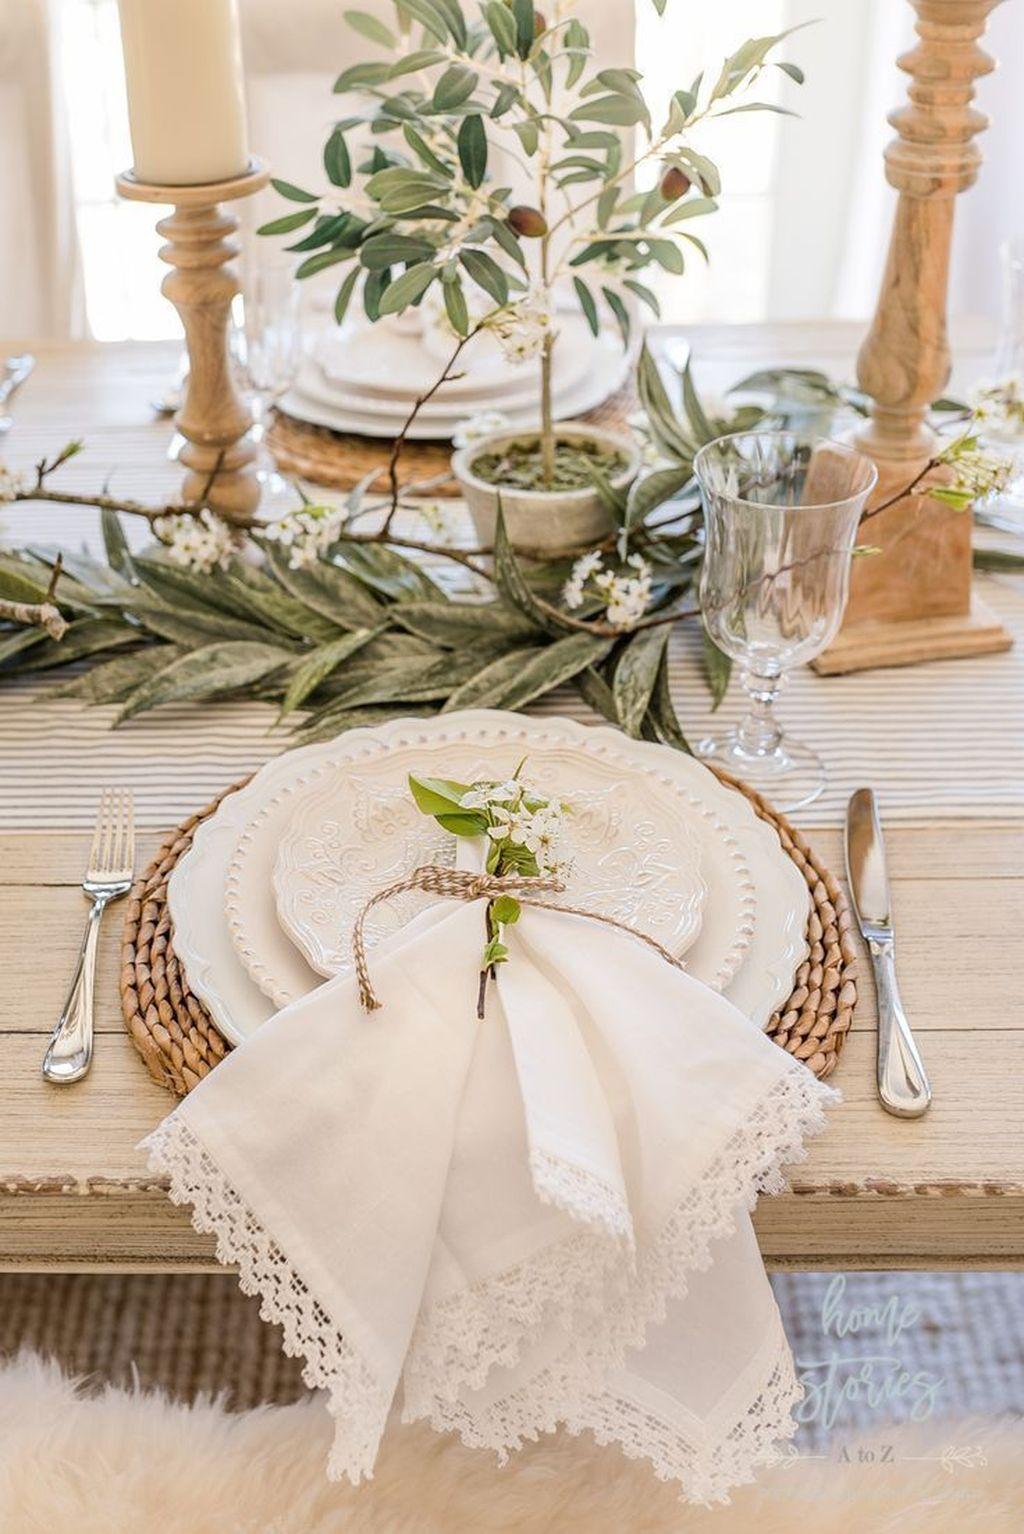 The Best Farmhouse Style Spring Tablescape Decor Ideas 17